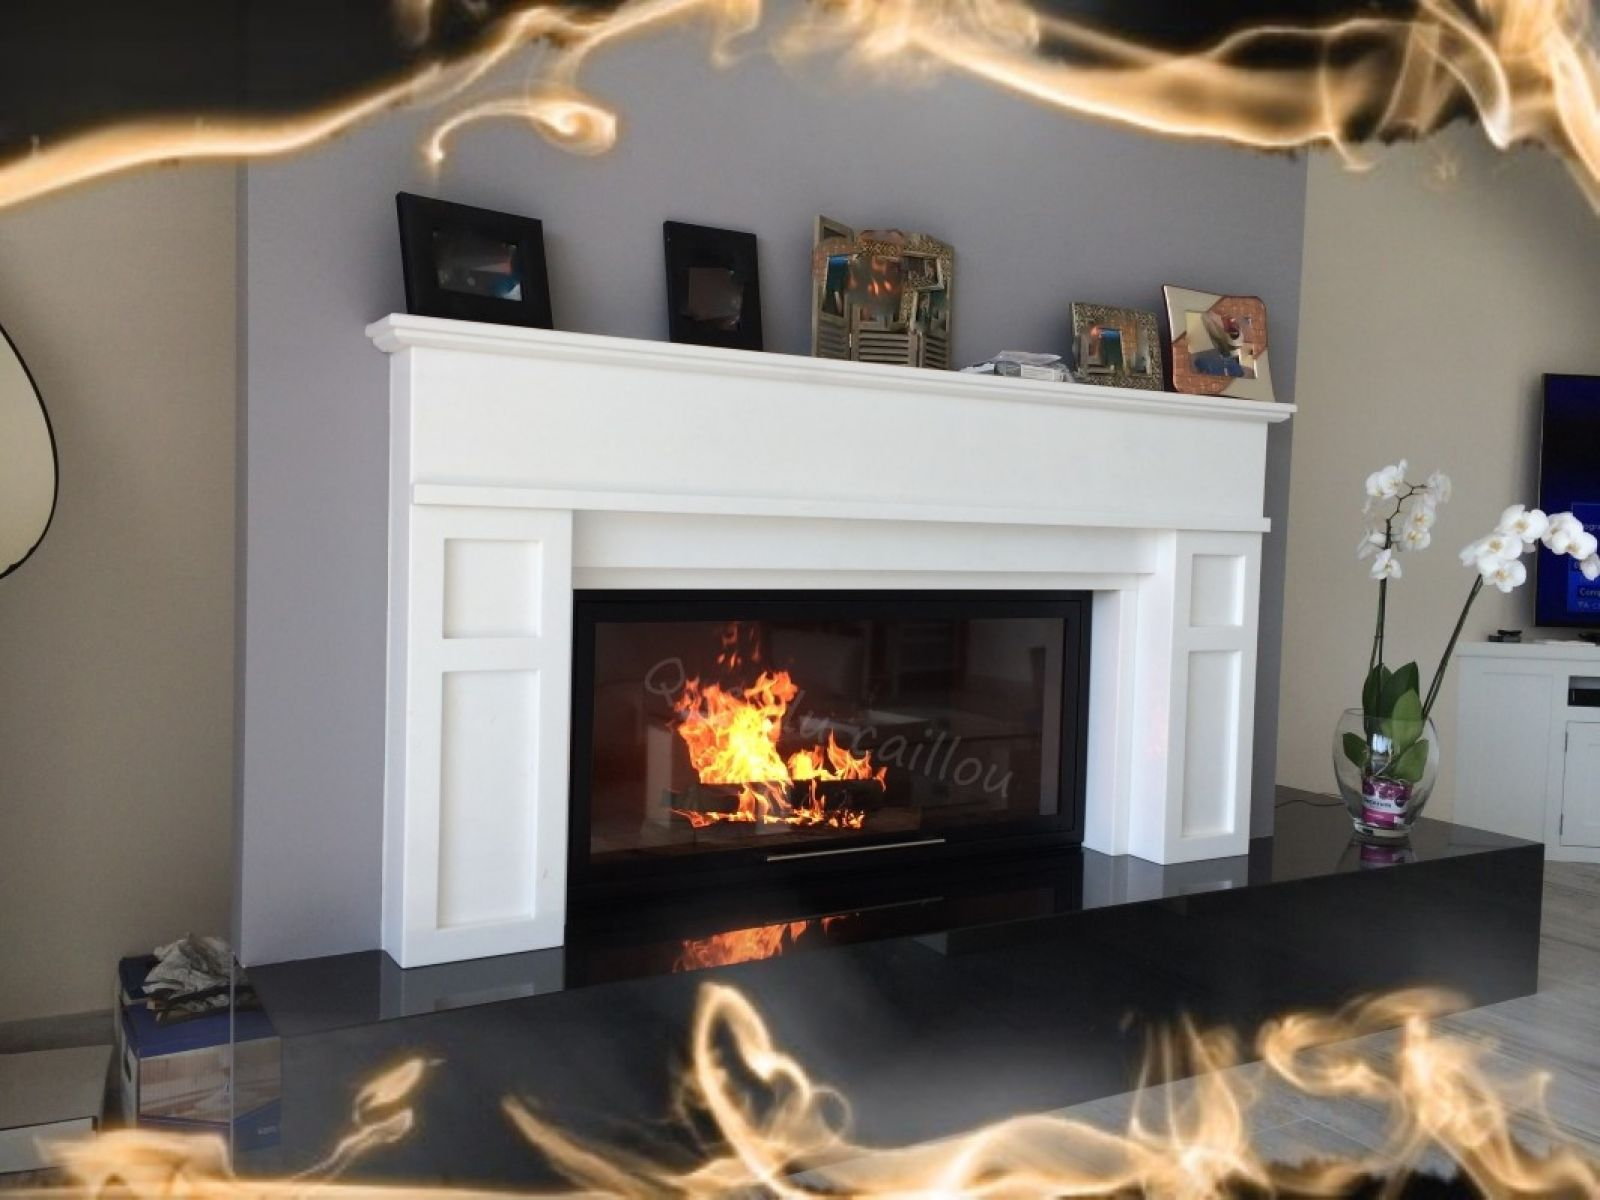 Cheminee En Granit Noir Et Marbre Blanc Avec Foyer Ferme Installee A